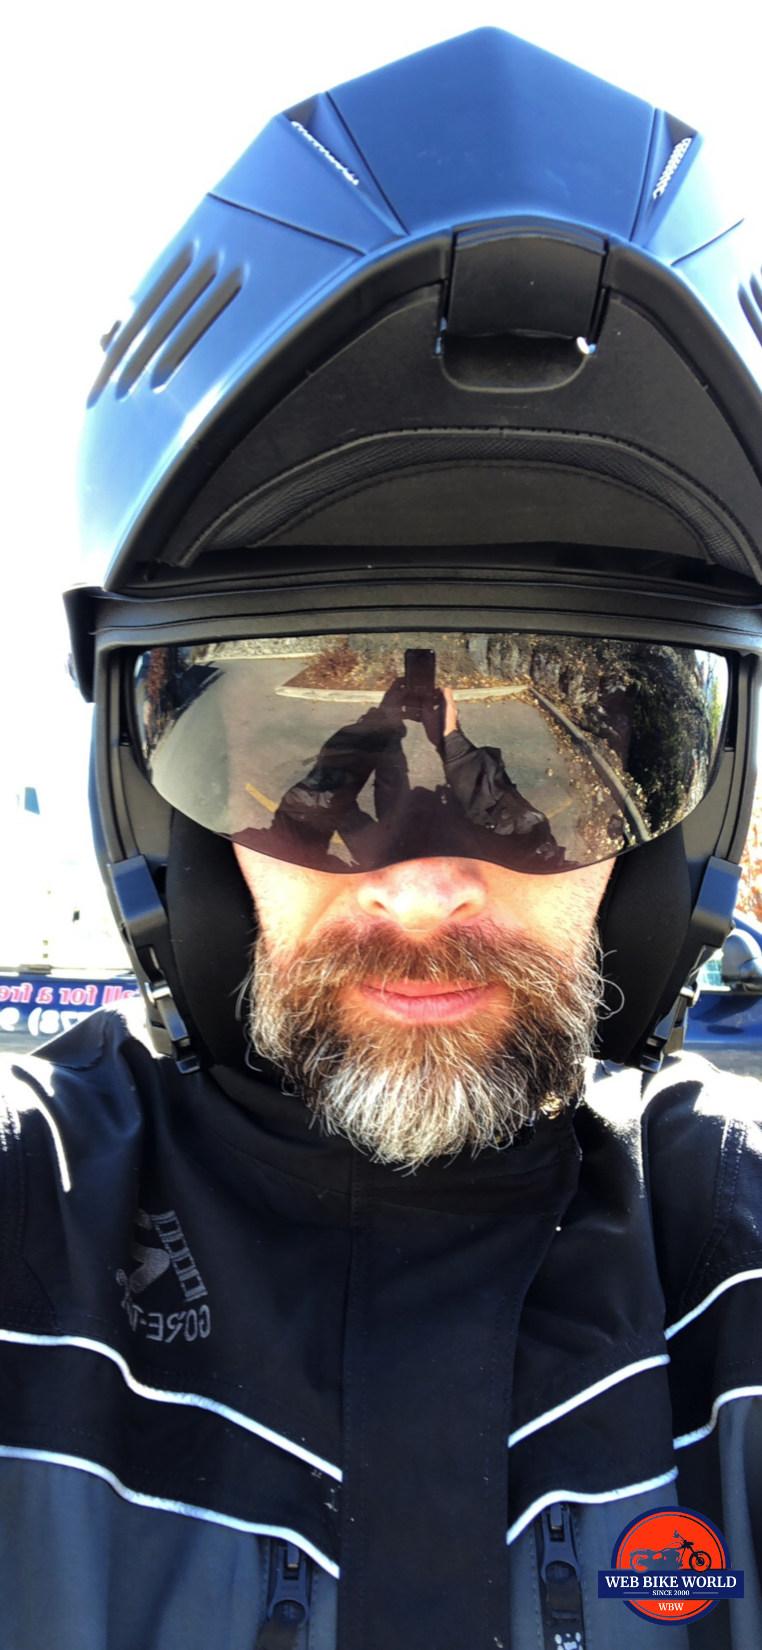 Me wearing the Simpson Mod Bandit helmet